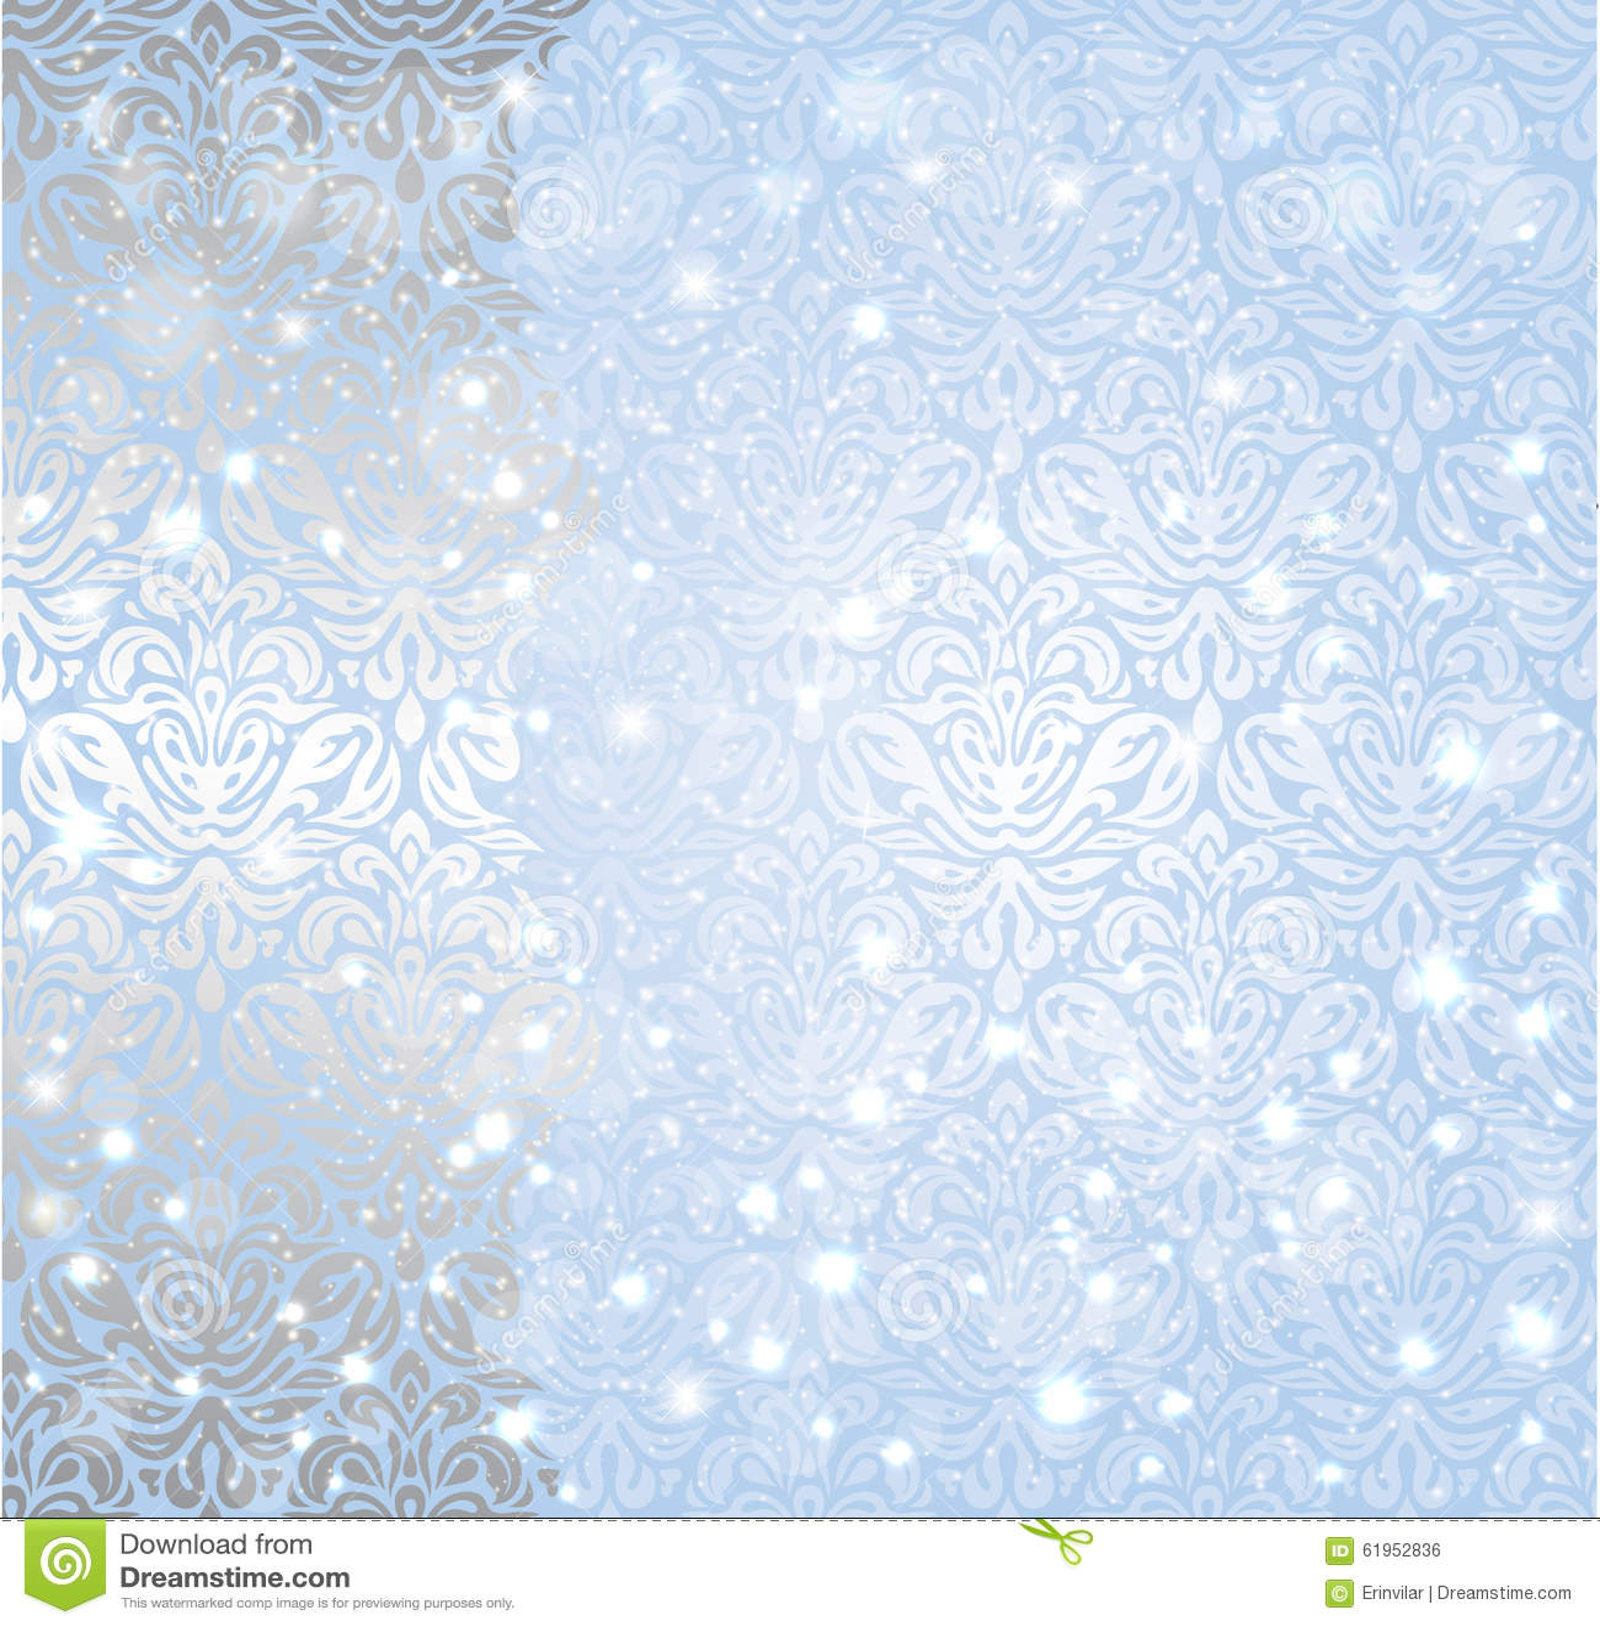 shiny blue christmas winter snowflake vintage background